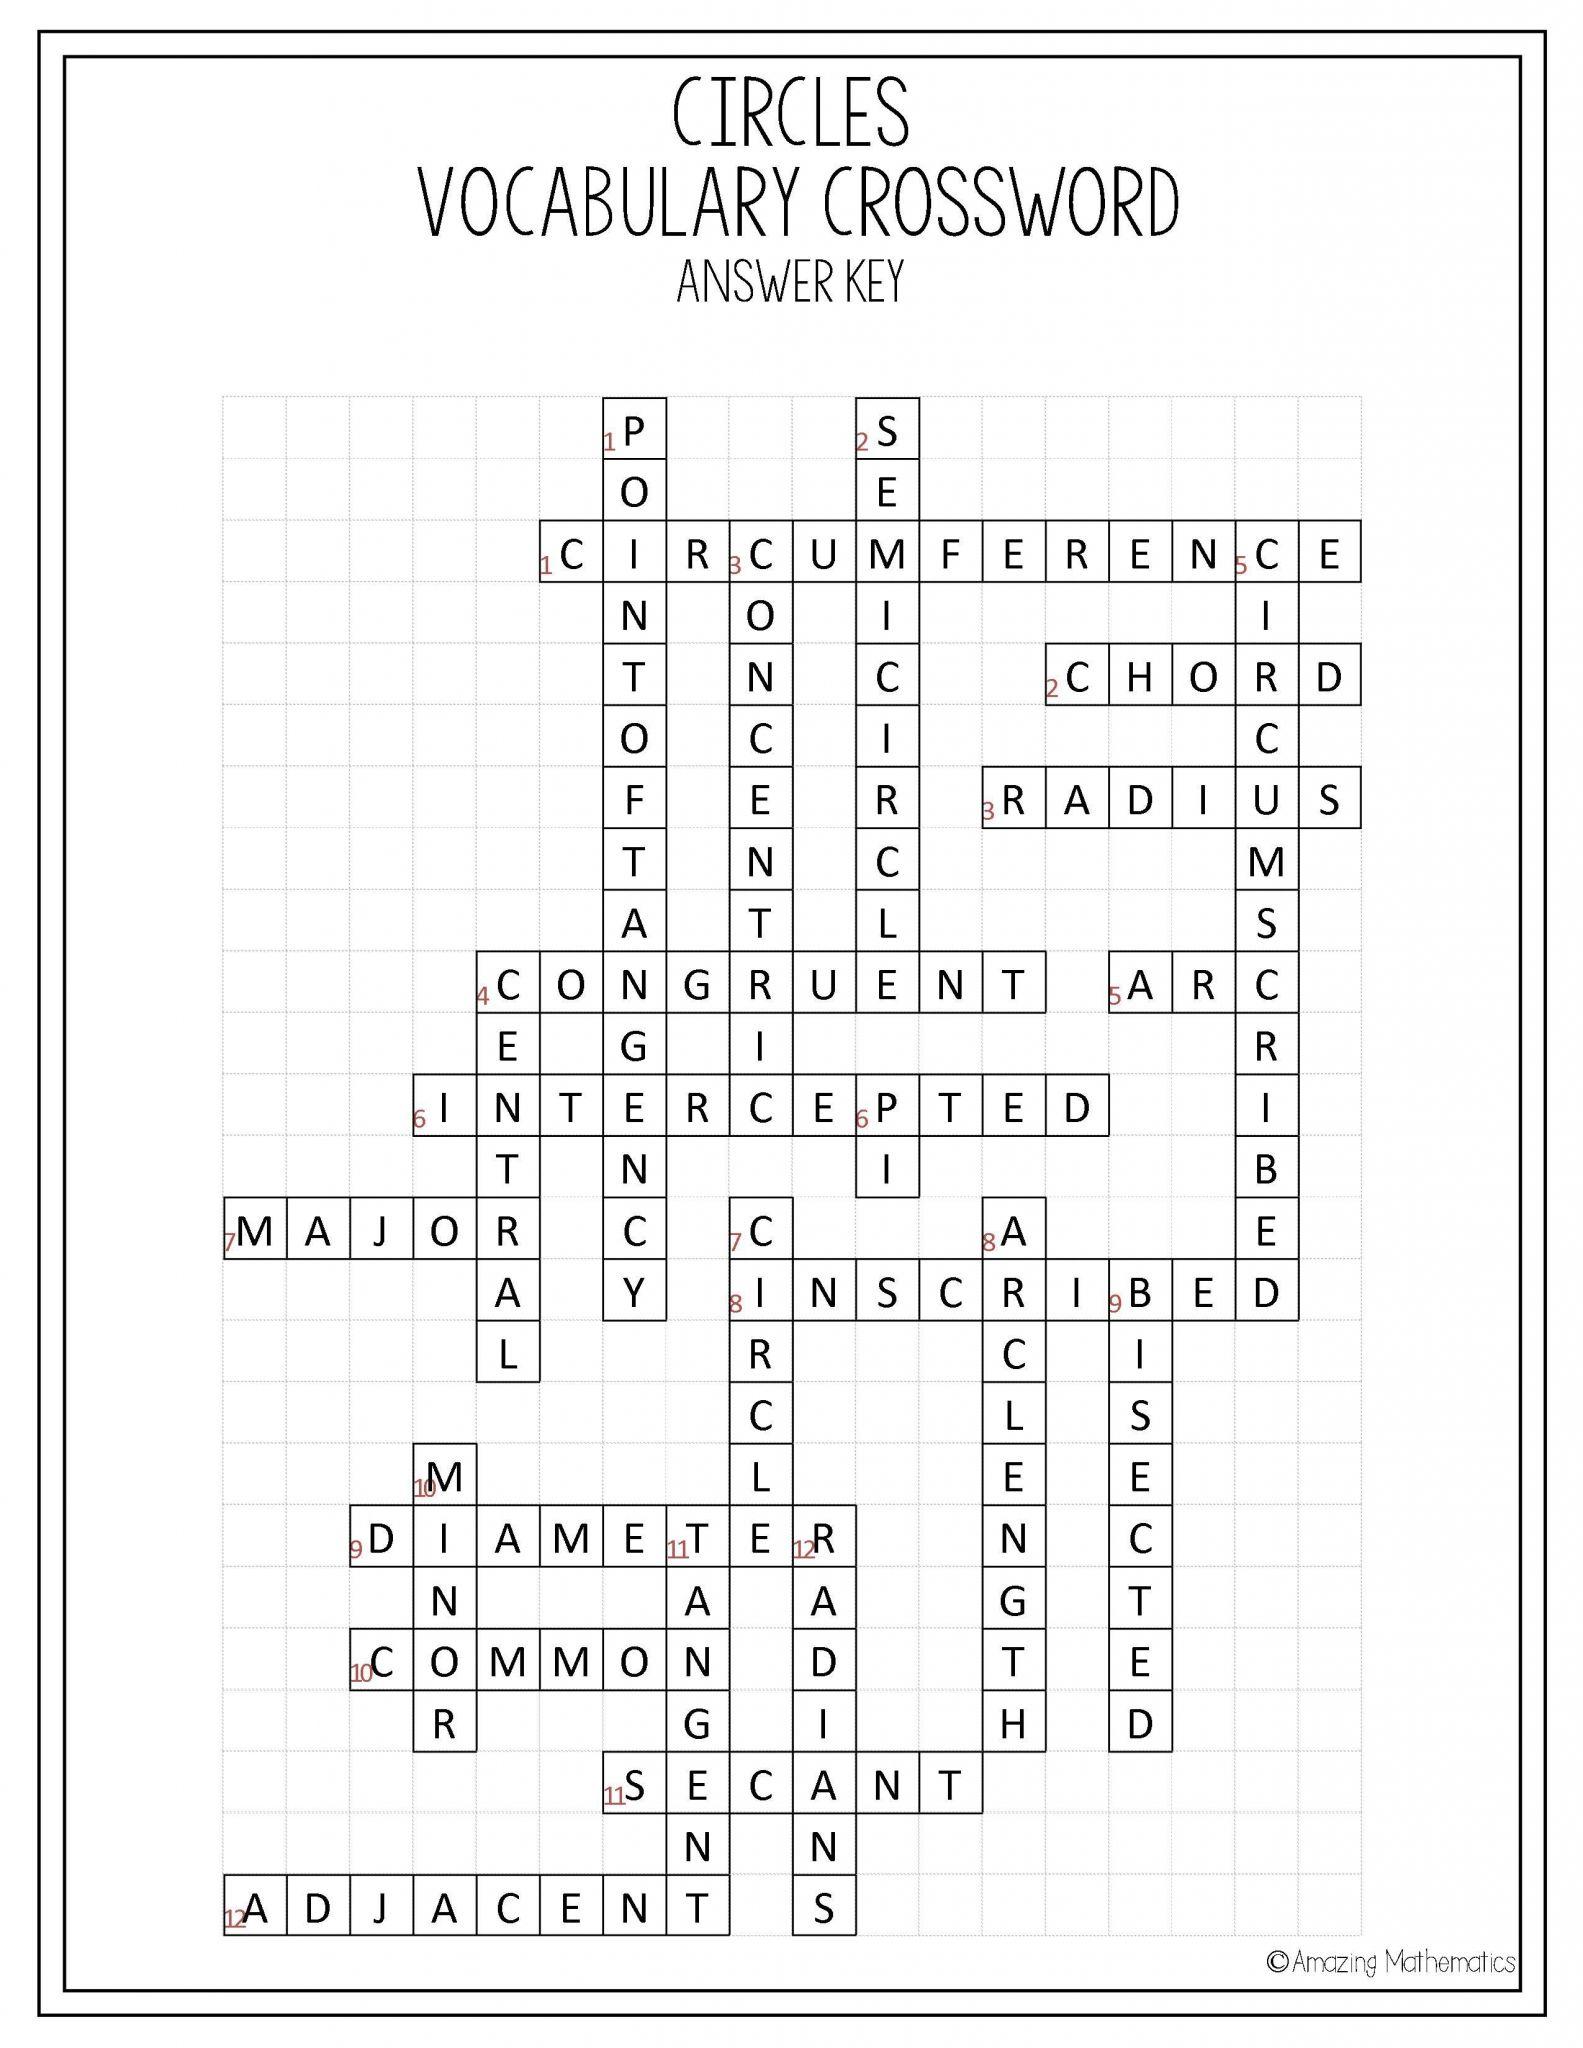 Geometry Cpctc Worksheet Answers Key